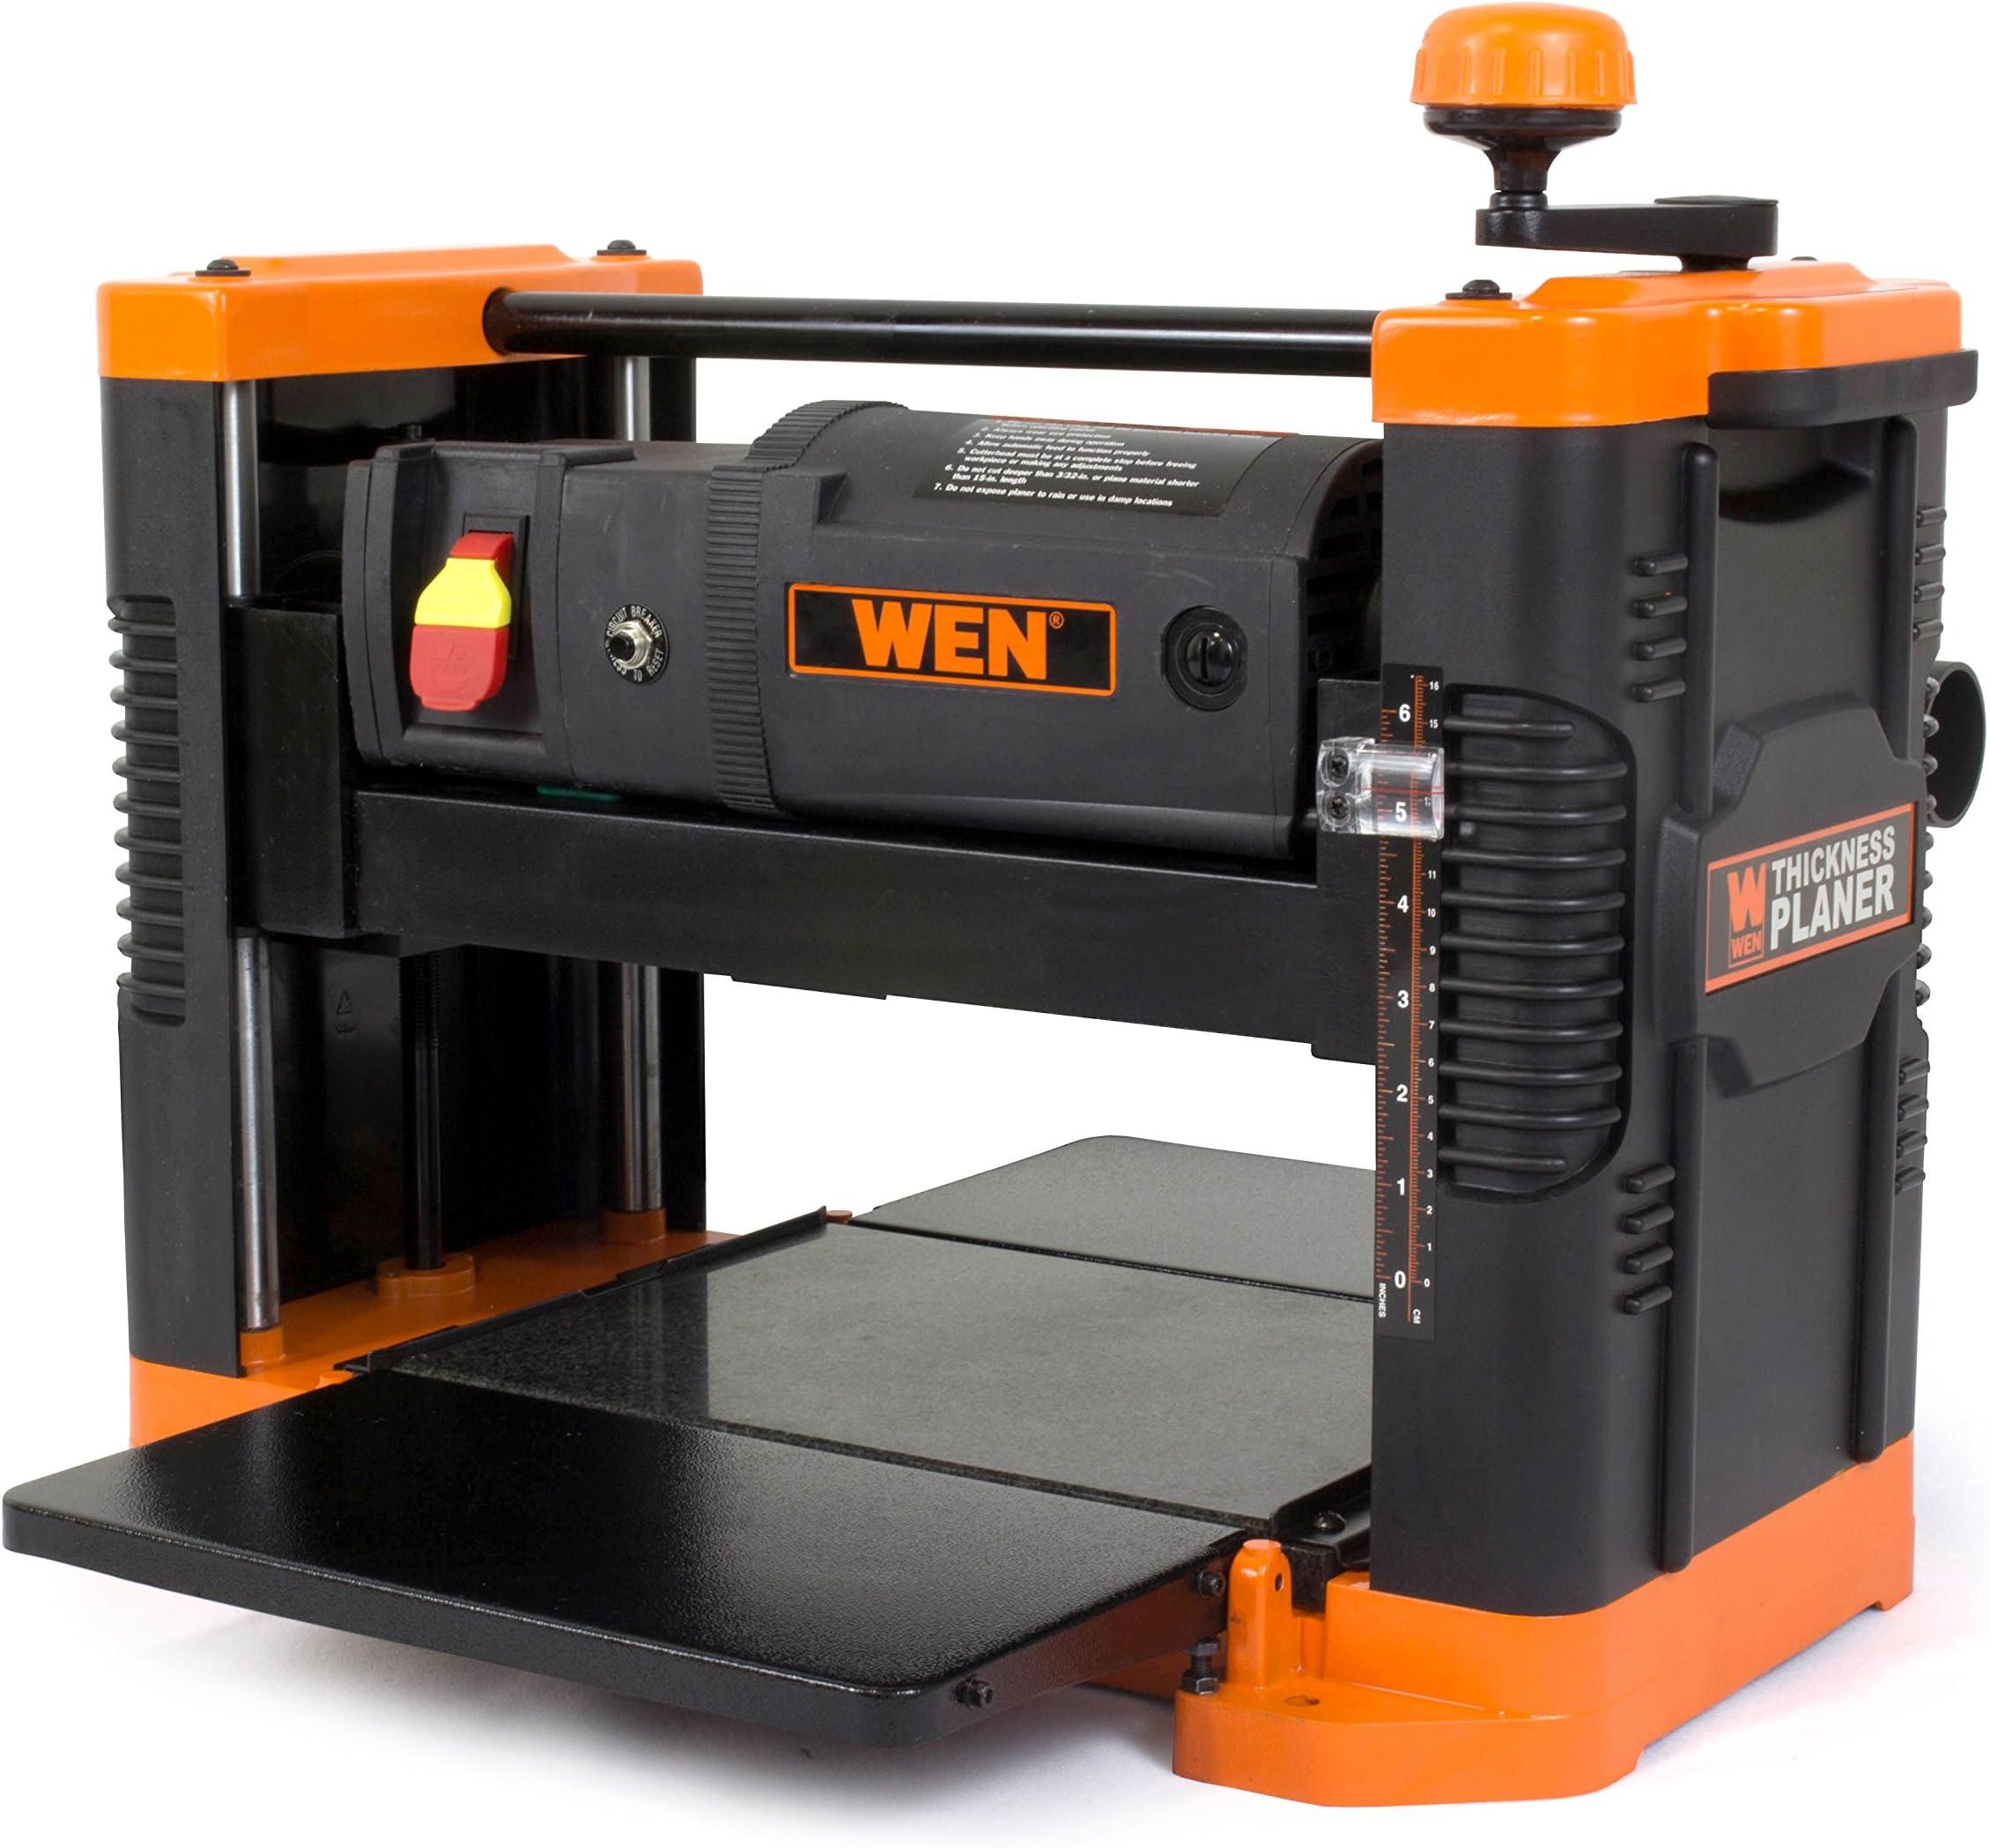 WEN 6550 Benchtop Thickness Planer 12-1/2   sc 1 st  Amazon.com & Amazon.com: Planers - Power Tools: Tools u0026 Home Improvement ...